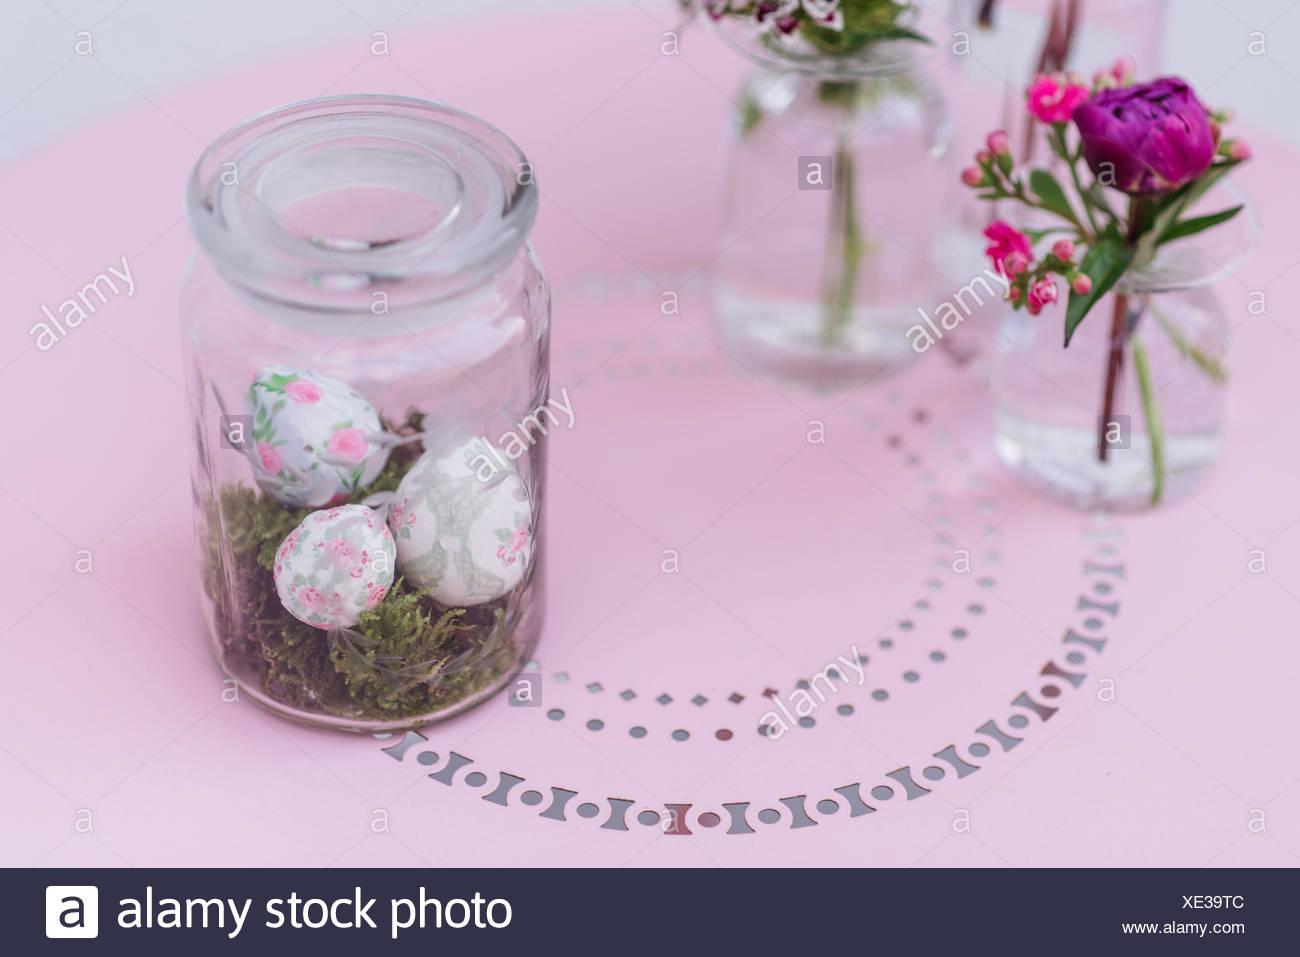 Ostern Dekoration Glas Eier Blumen Stockfoto Bild 284044668 Alamy